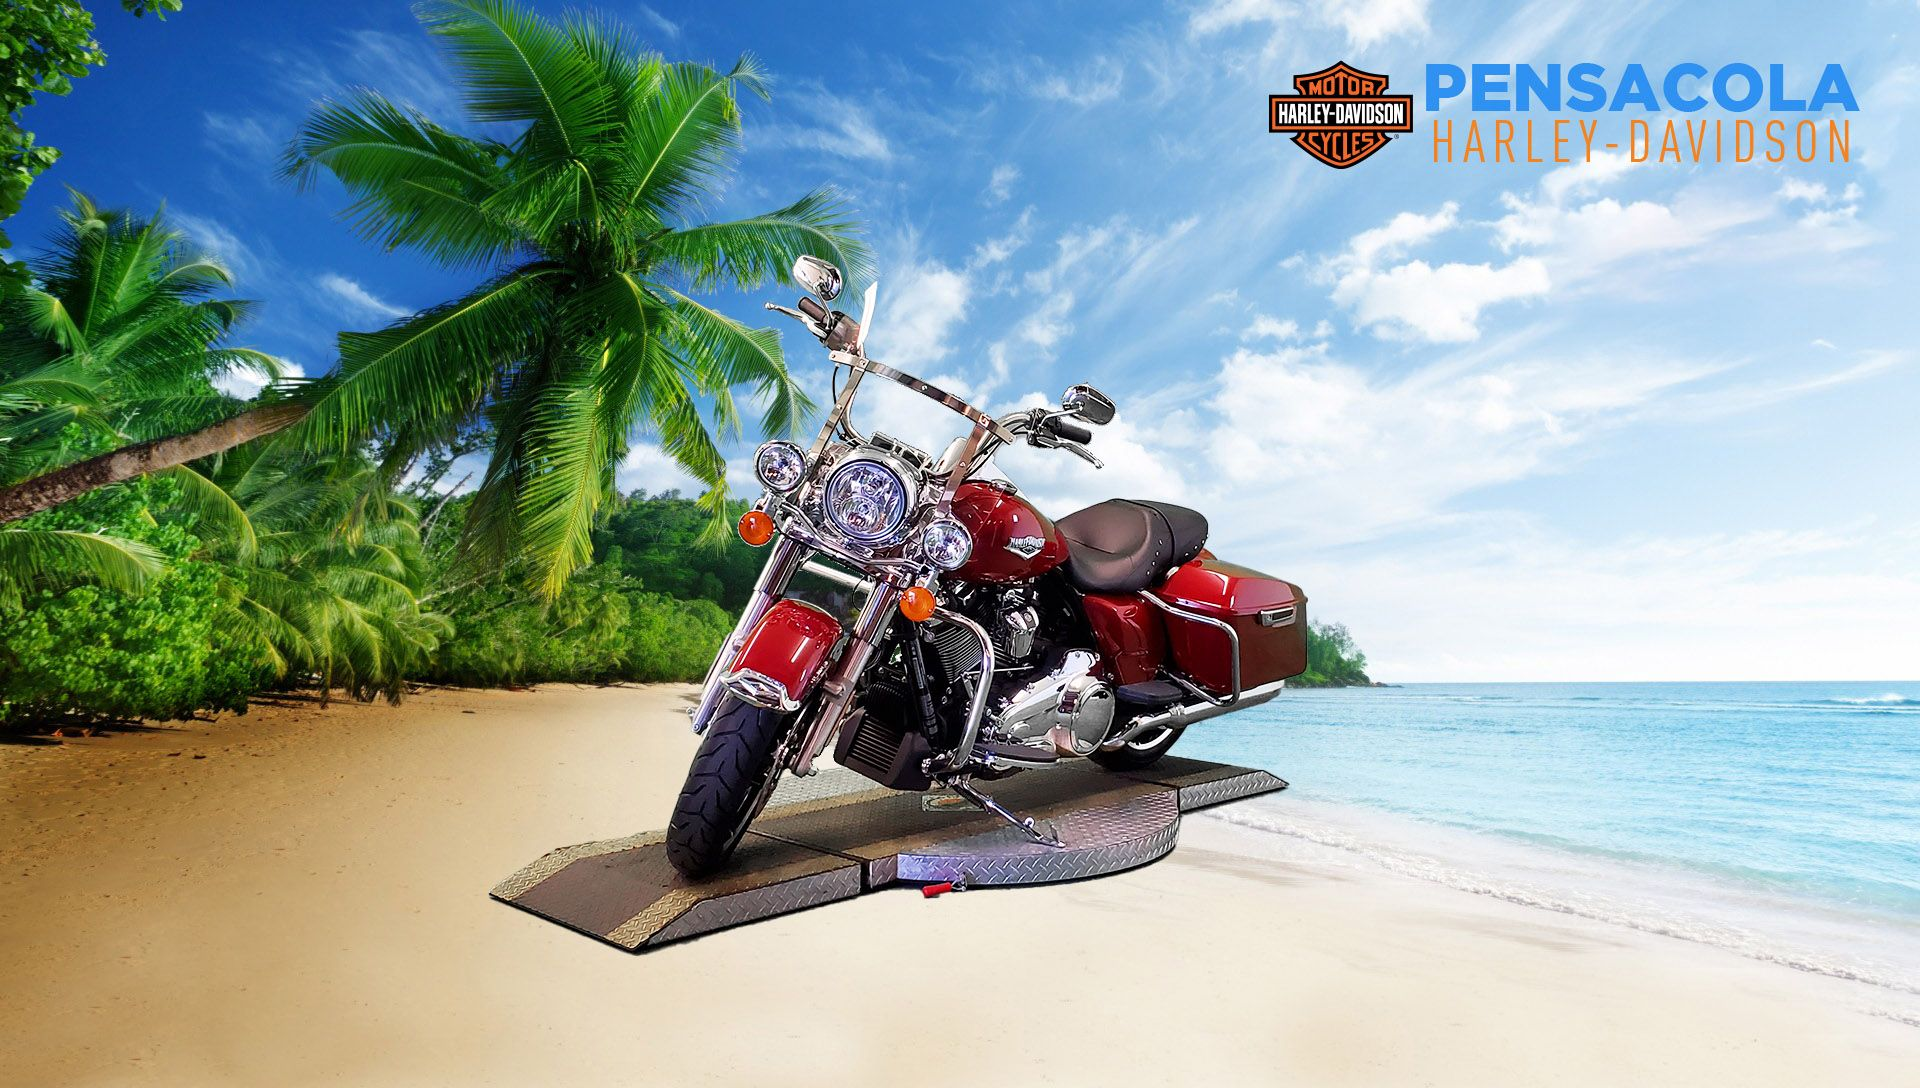 New 2021 Harley-Davidson Road King FLHR